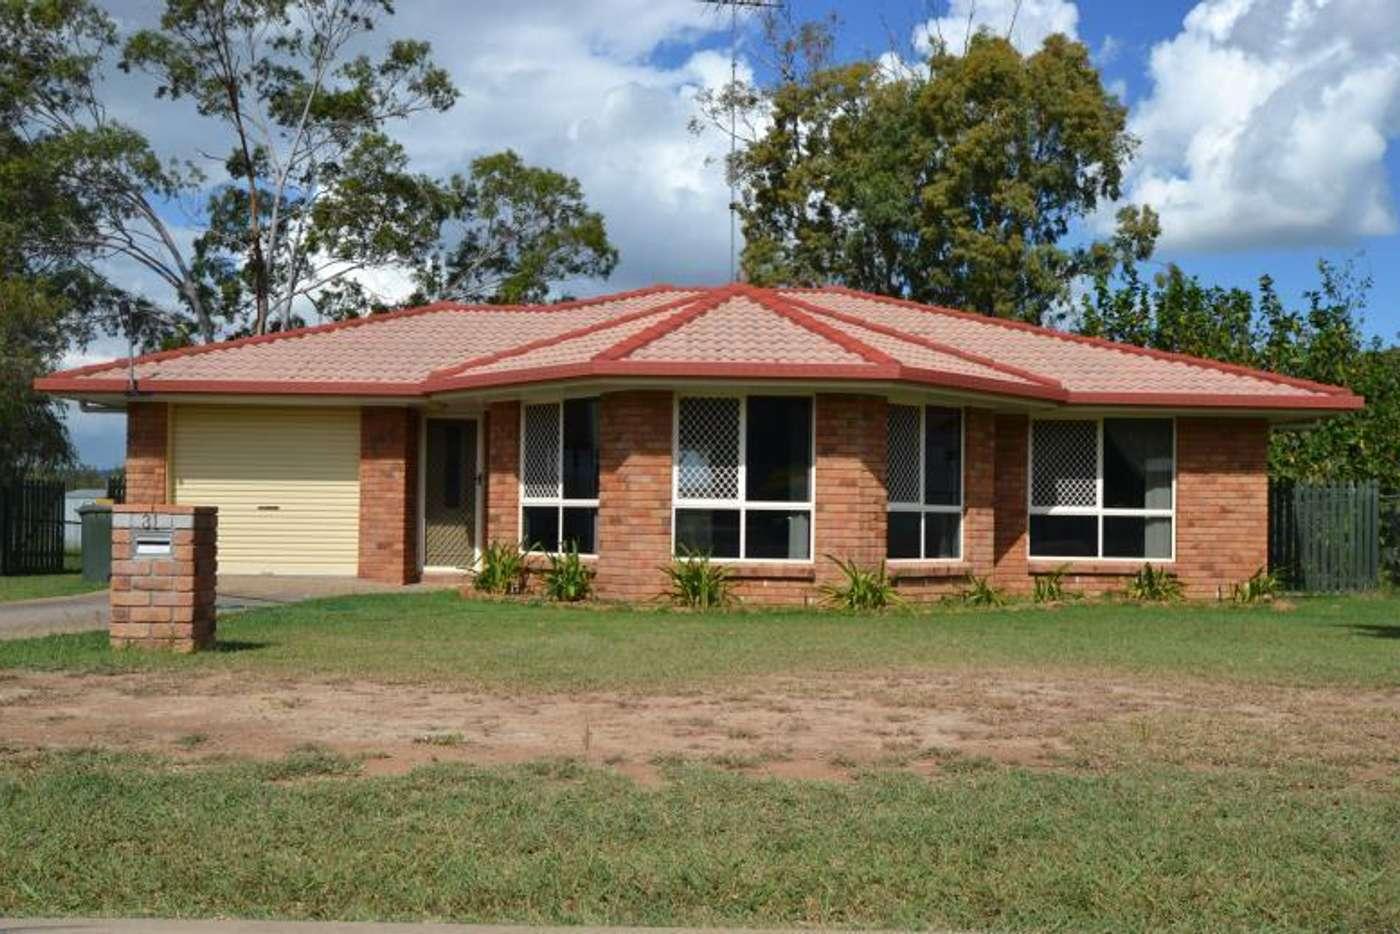 Main view of Homely house listing, 31 Joe Kooyman Drive, Biloela QLD 4715